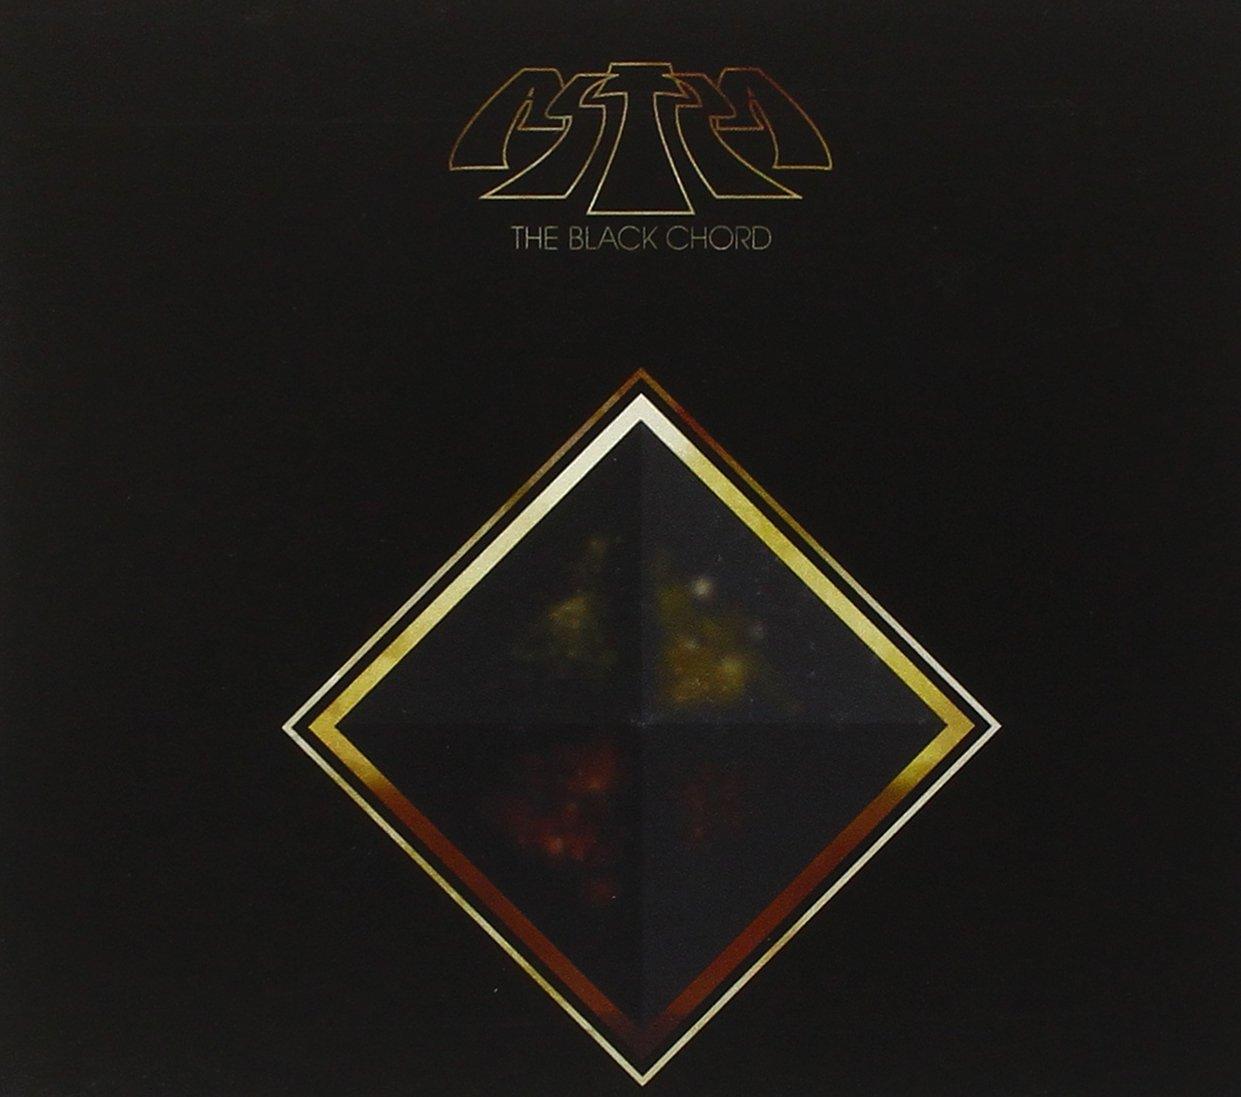 Astra The Black Chord Amazon Music